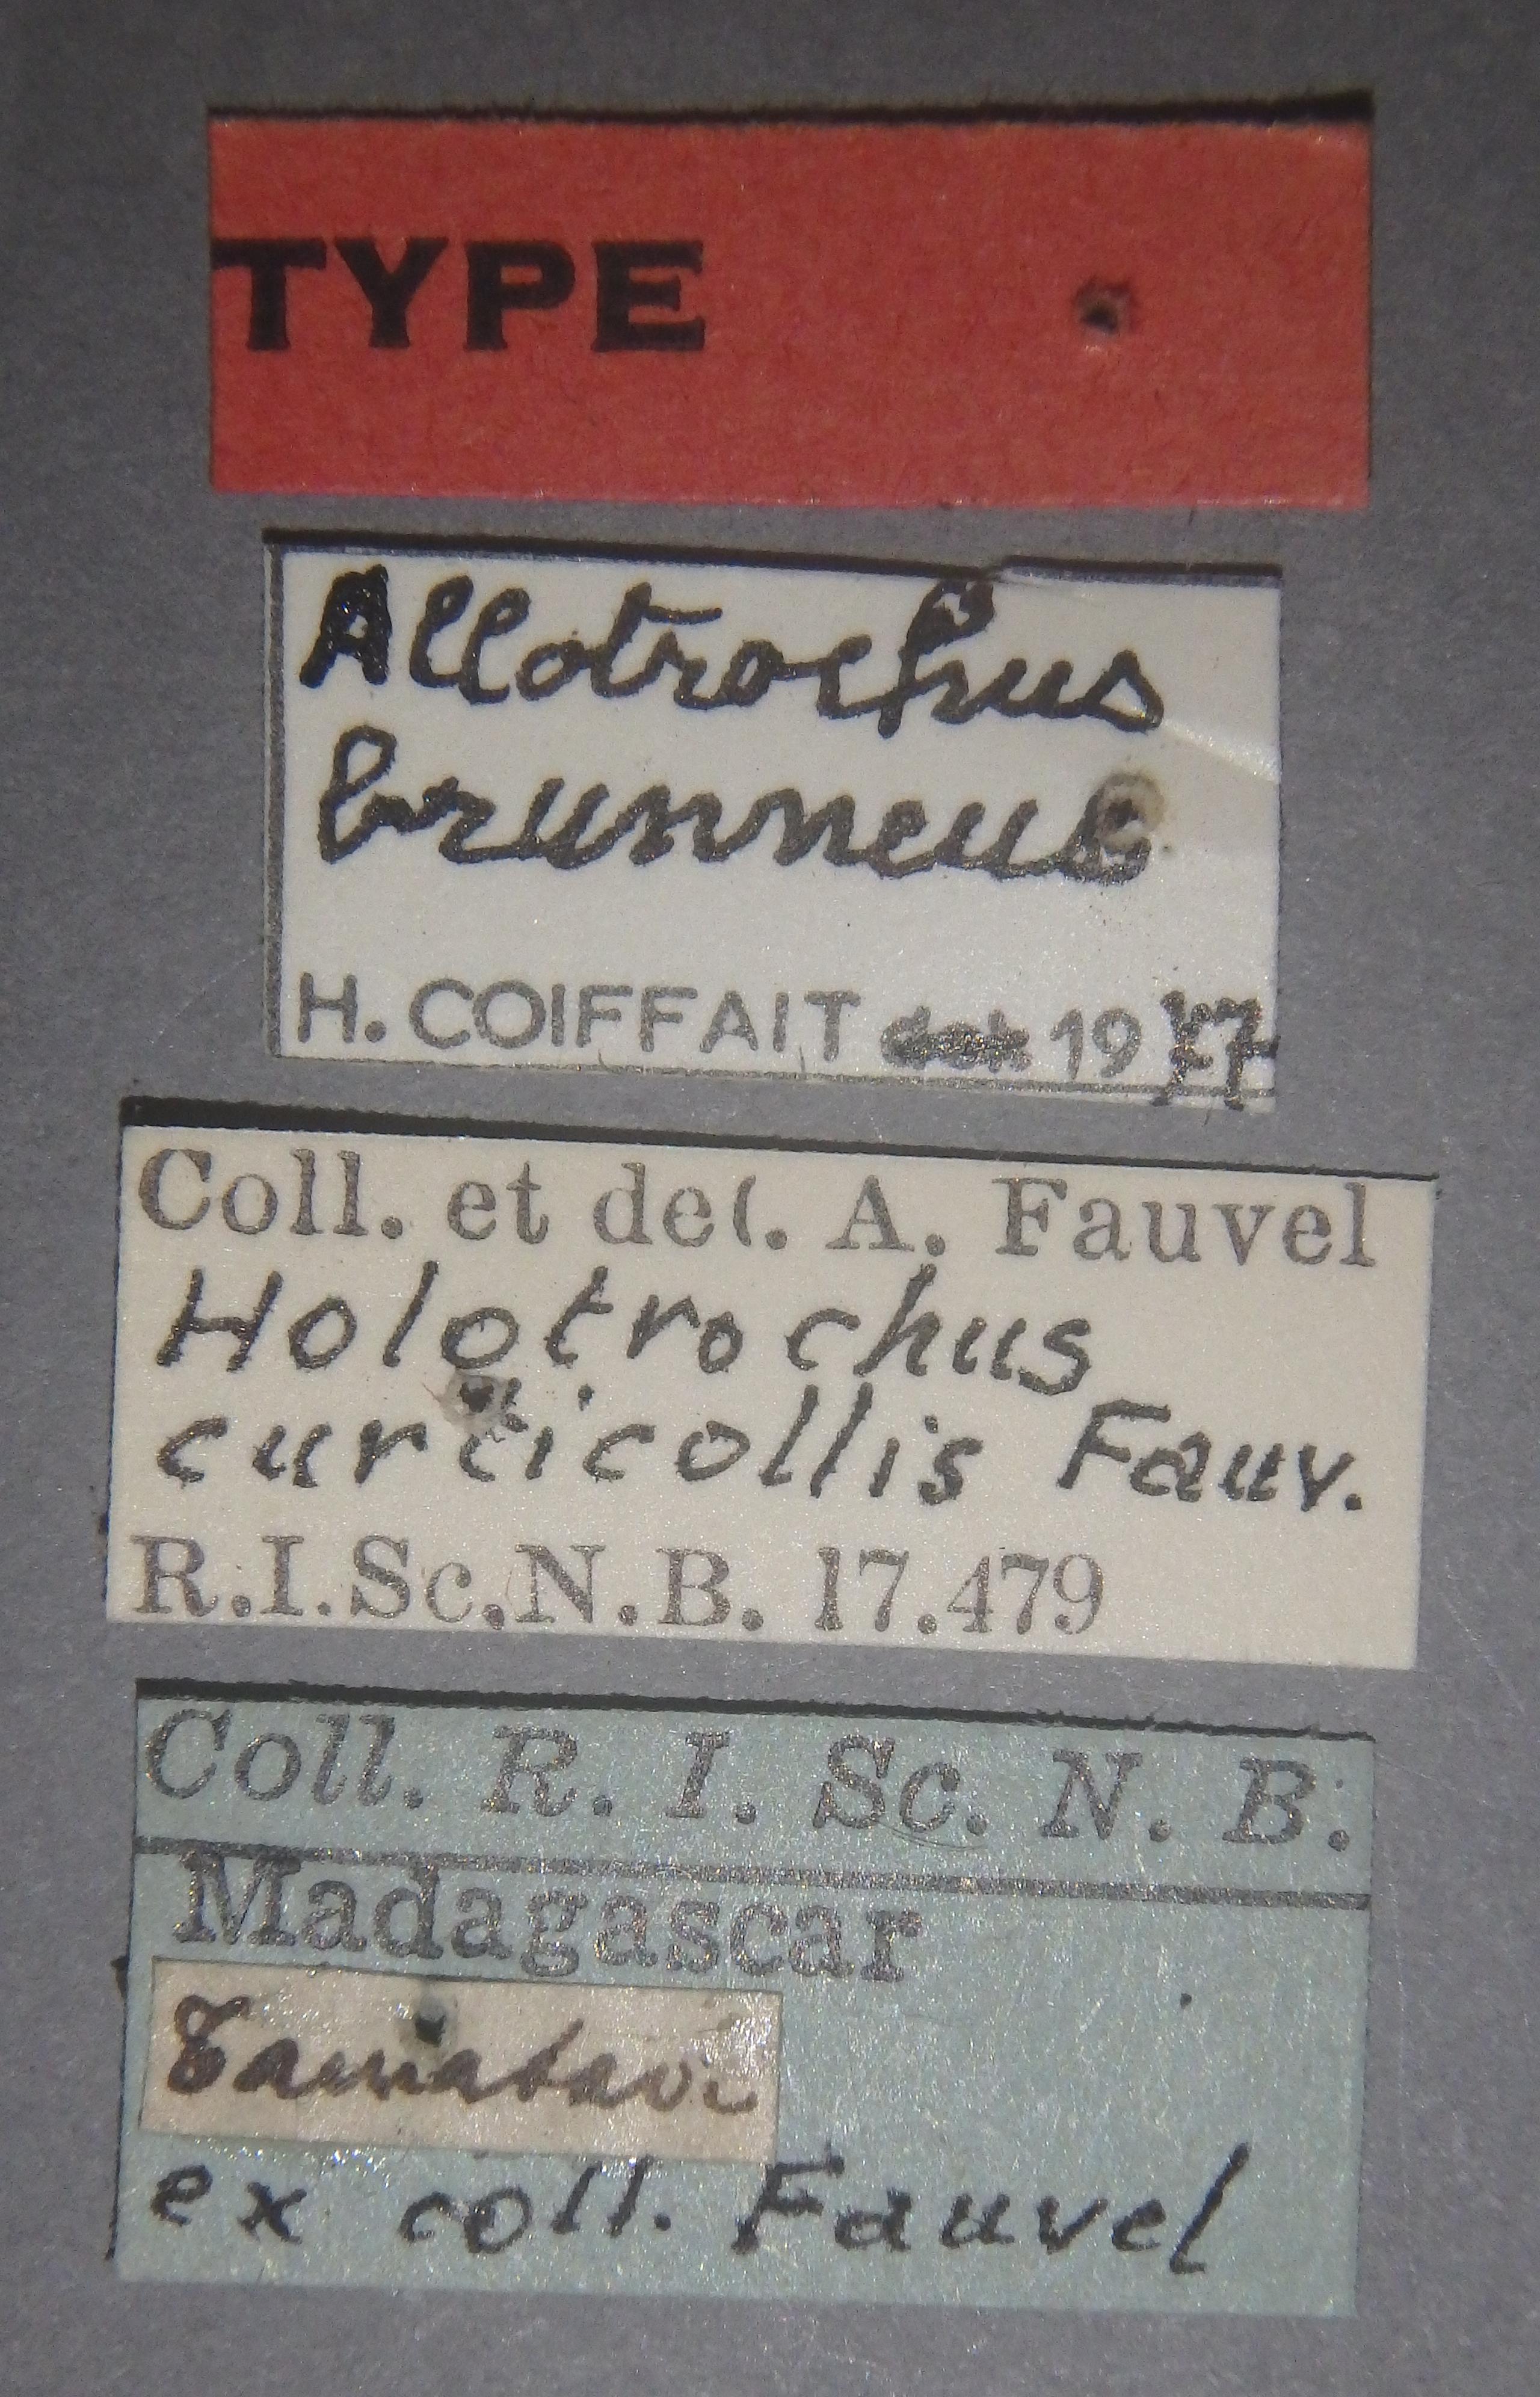 Holotrochus curticollis t Lb.JPG